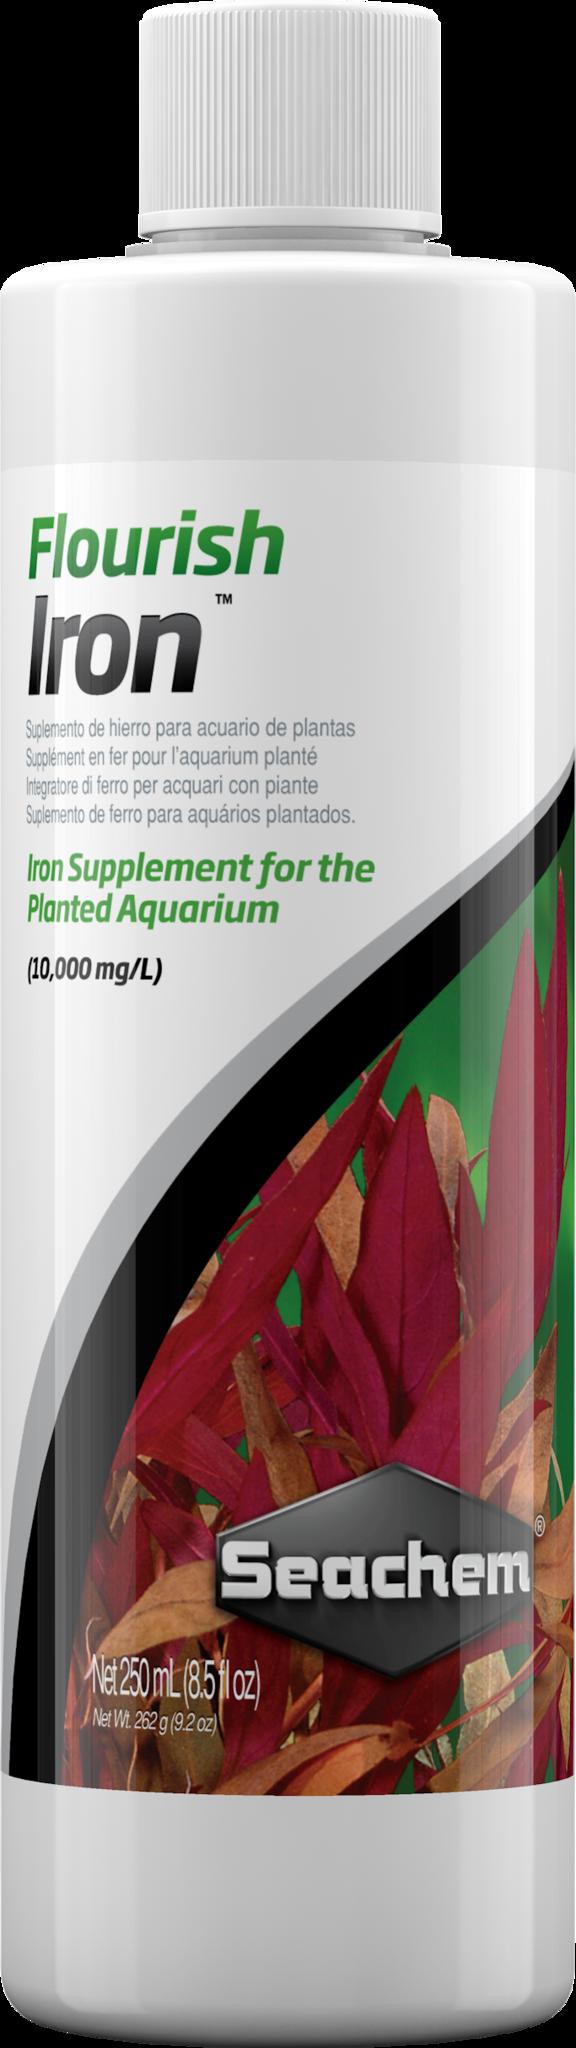 Seachem Florish  Iron 250 ml